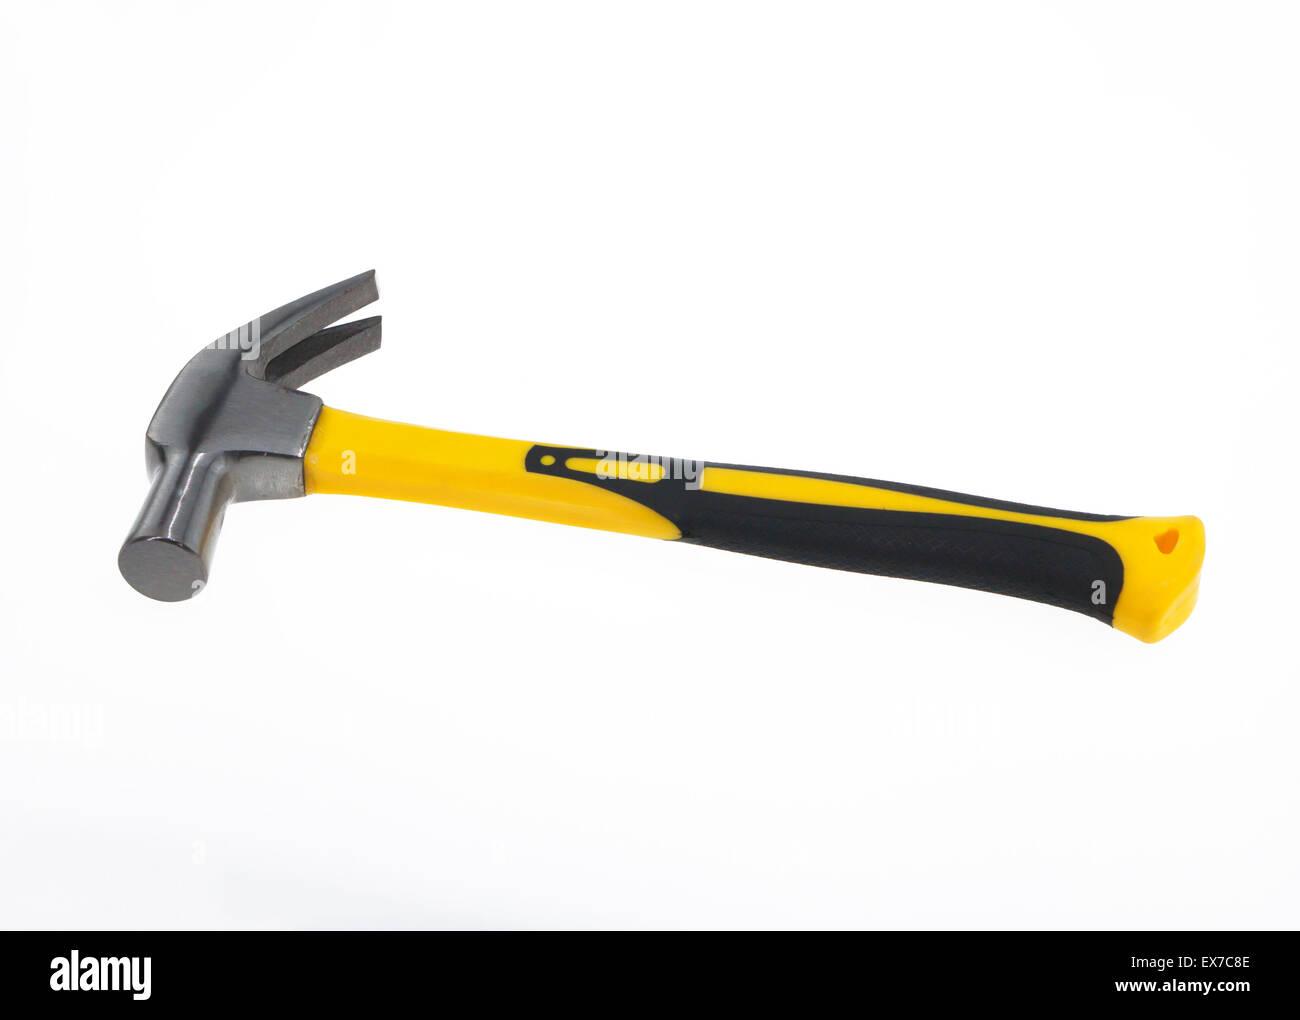 yellow-handled hammer isolated on white background. - Stock Image